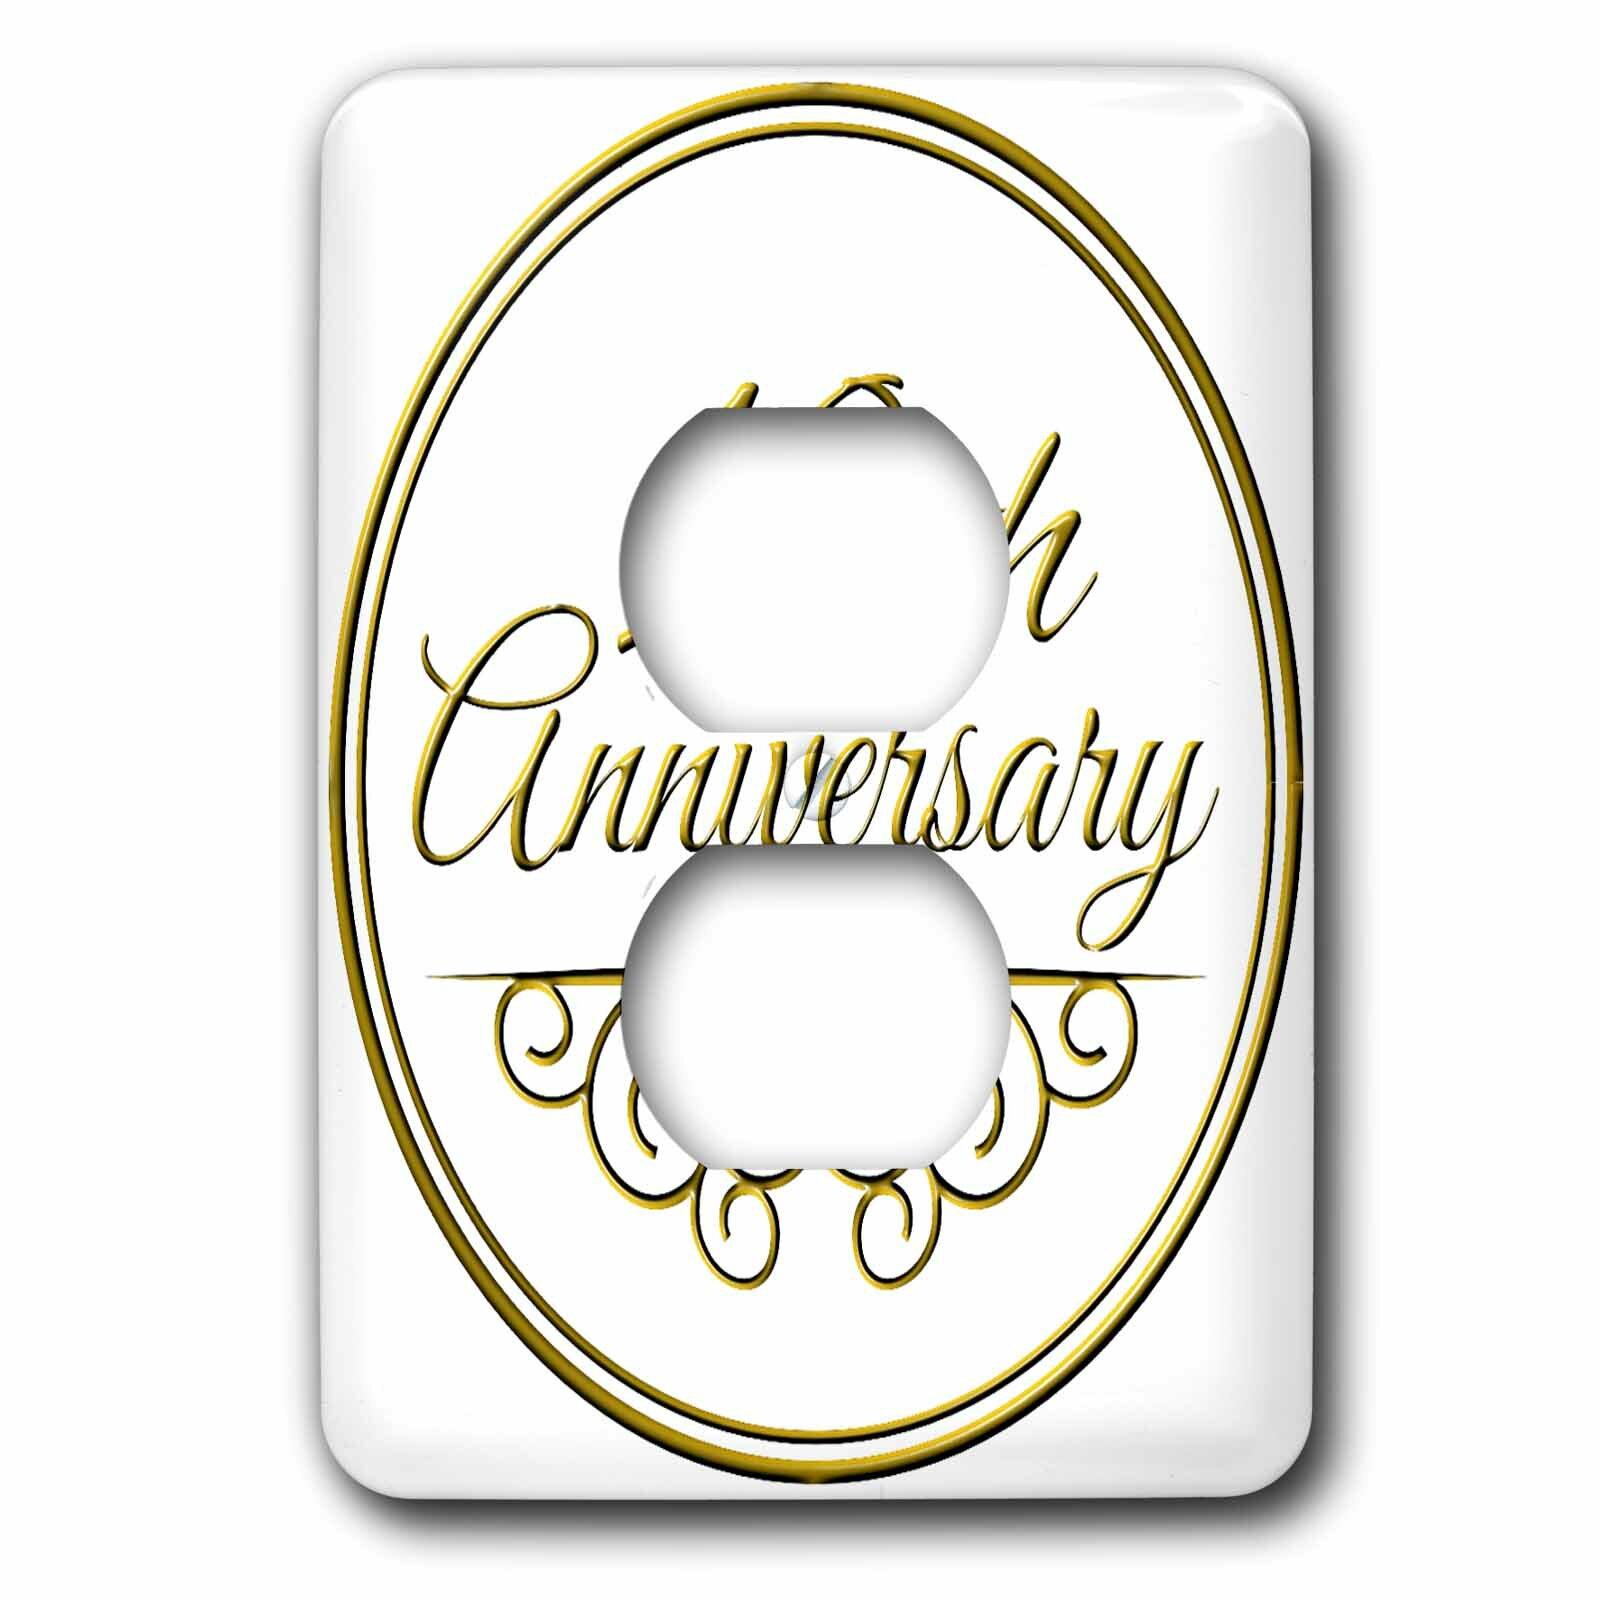 3drose 10th Anniversary Gift 1 Gang Duplex Outlet Wall Plate Wayfair